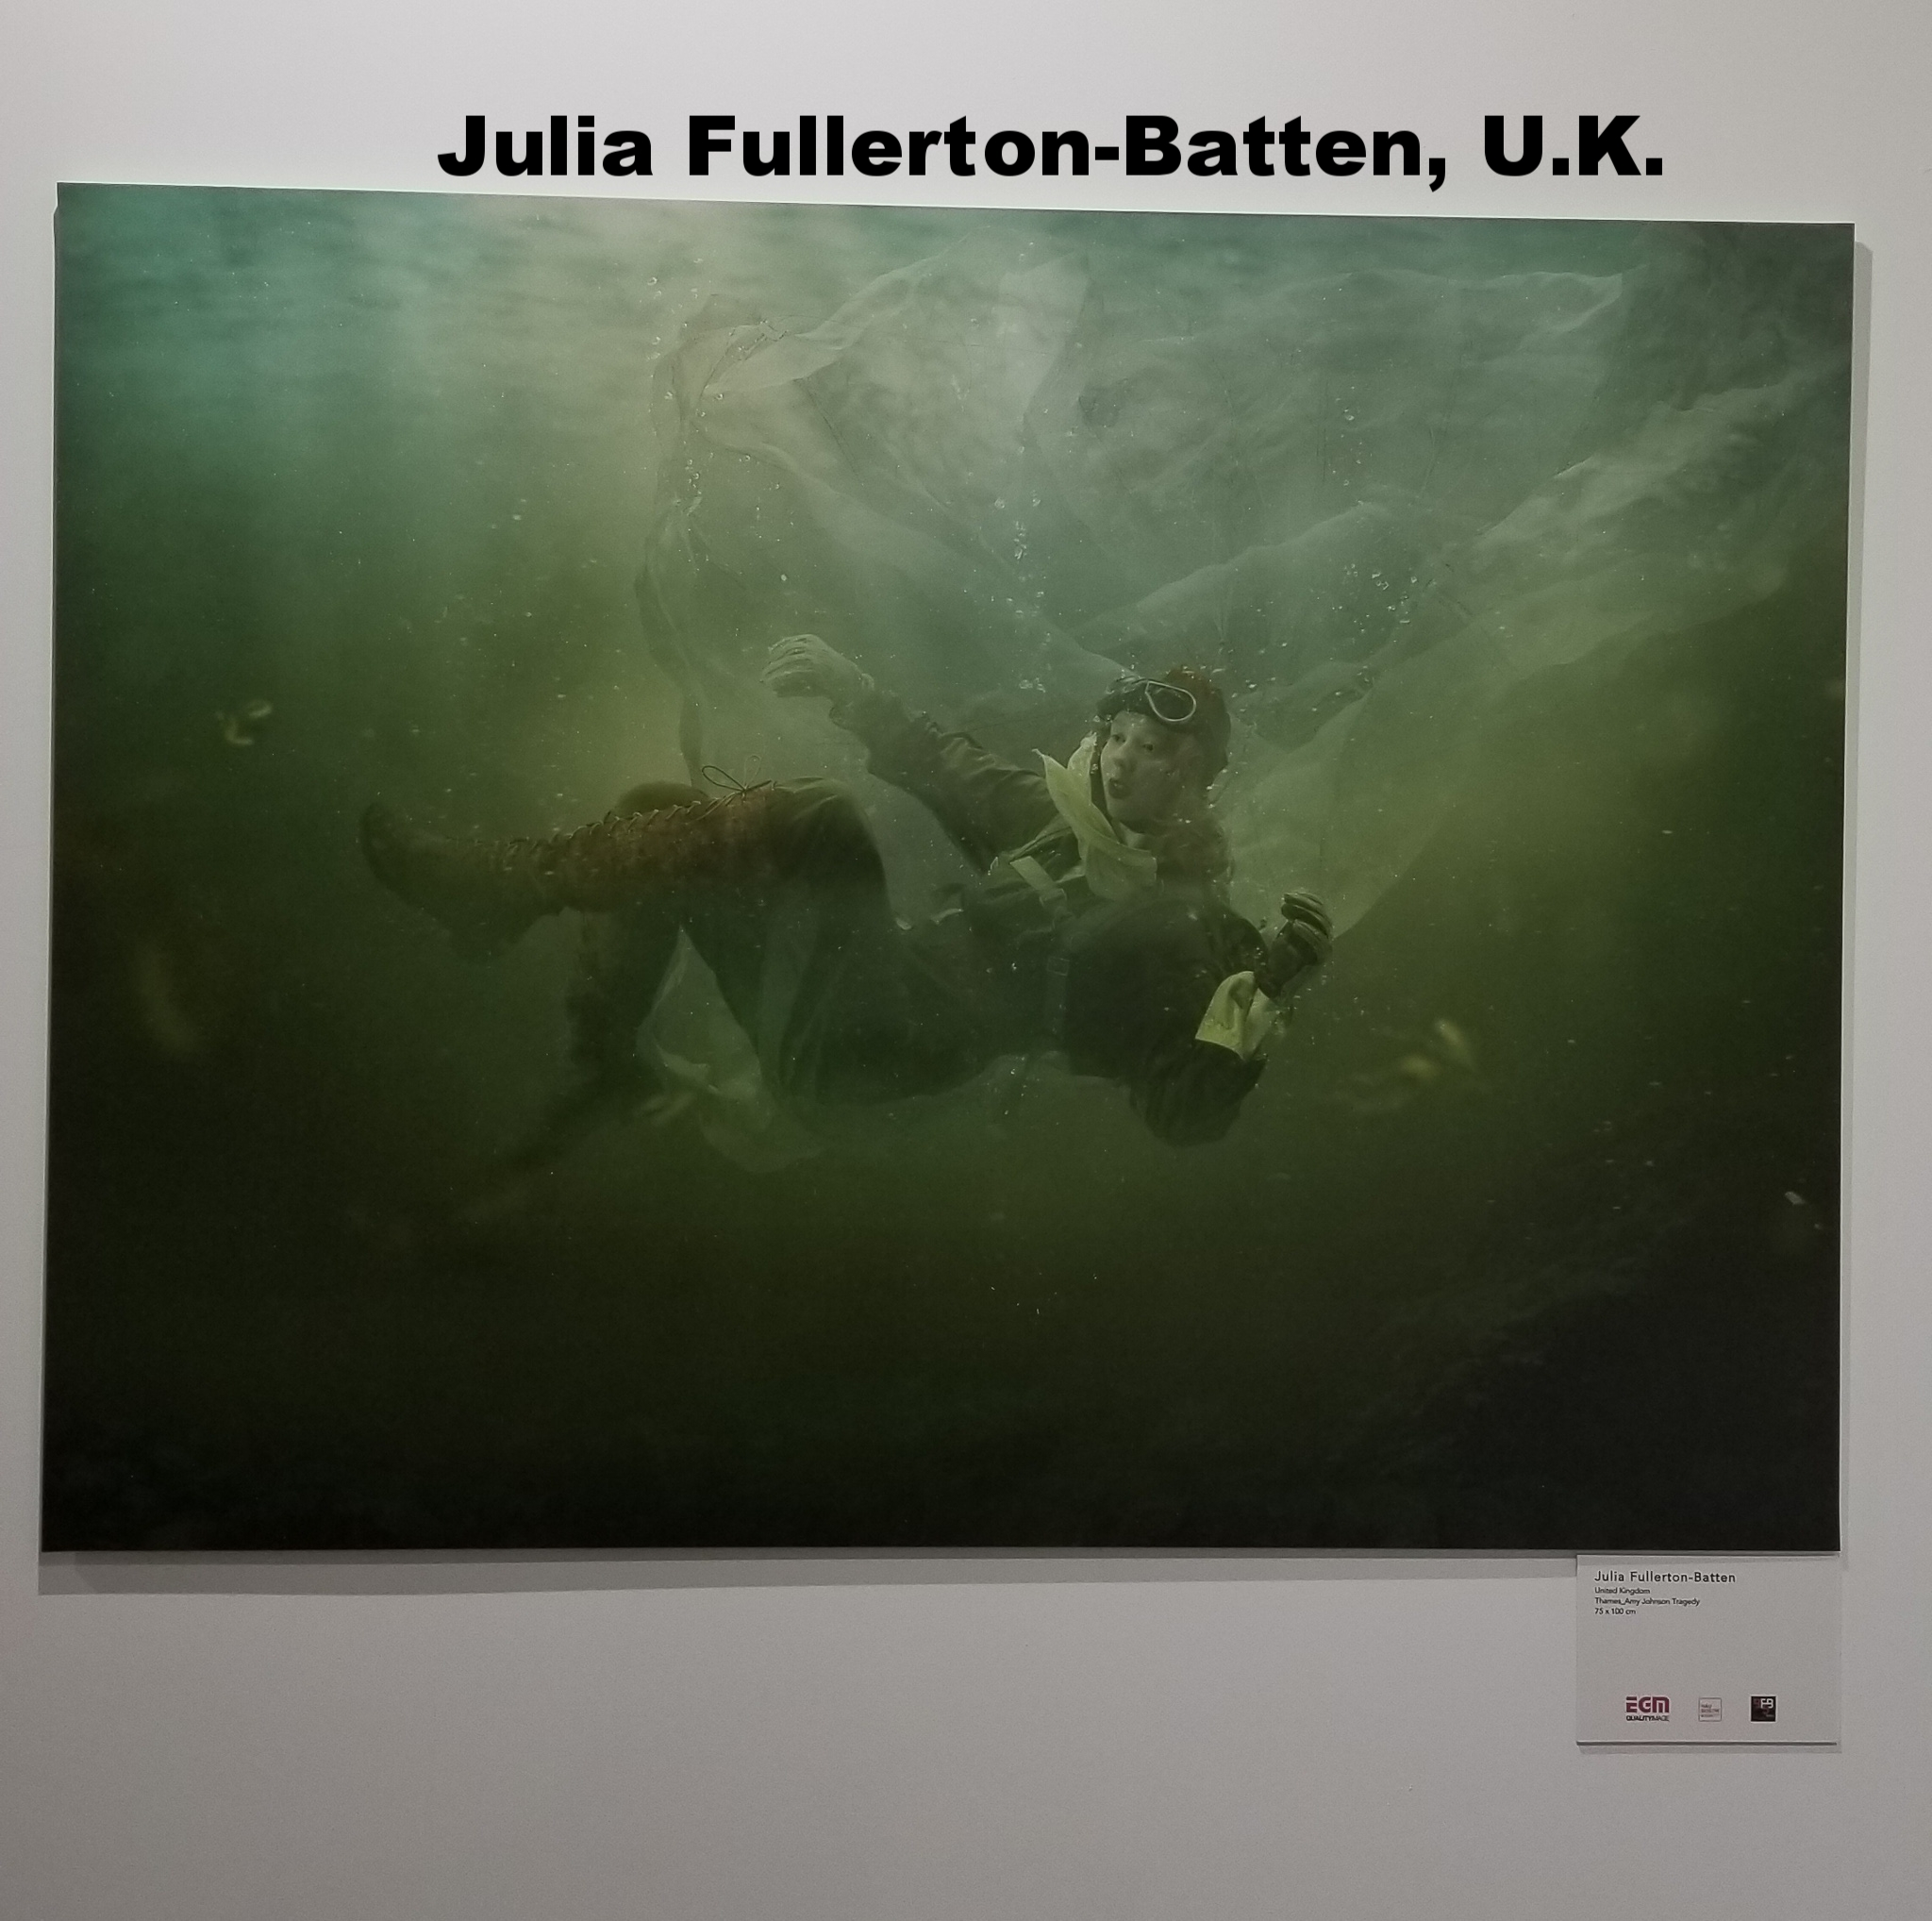 Julia Fullerton-Batten, United Kingdom